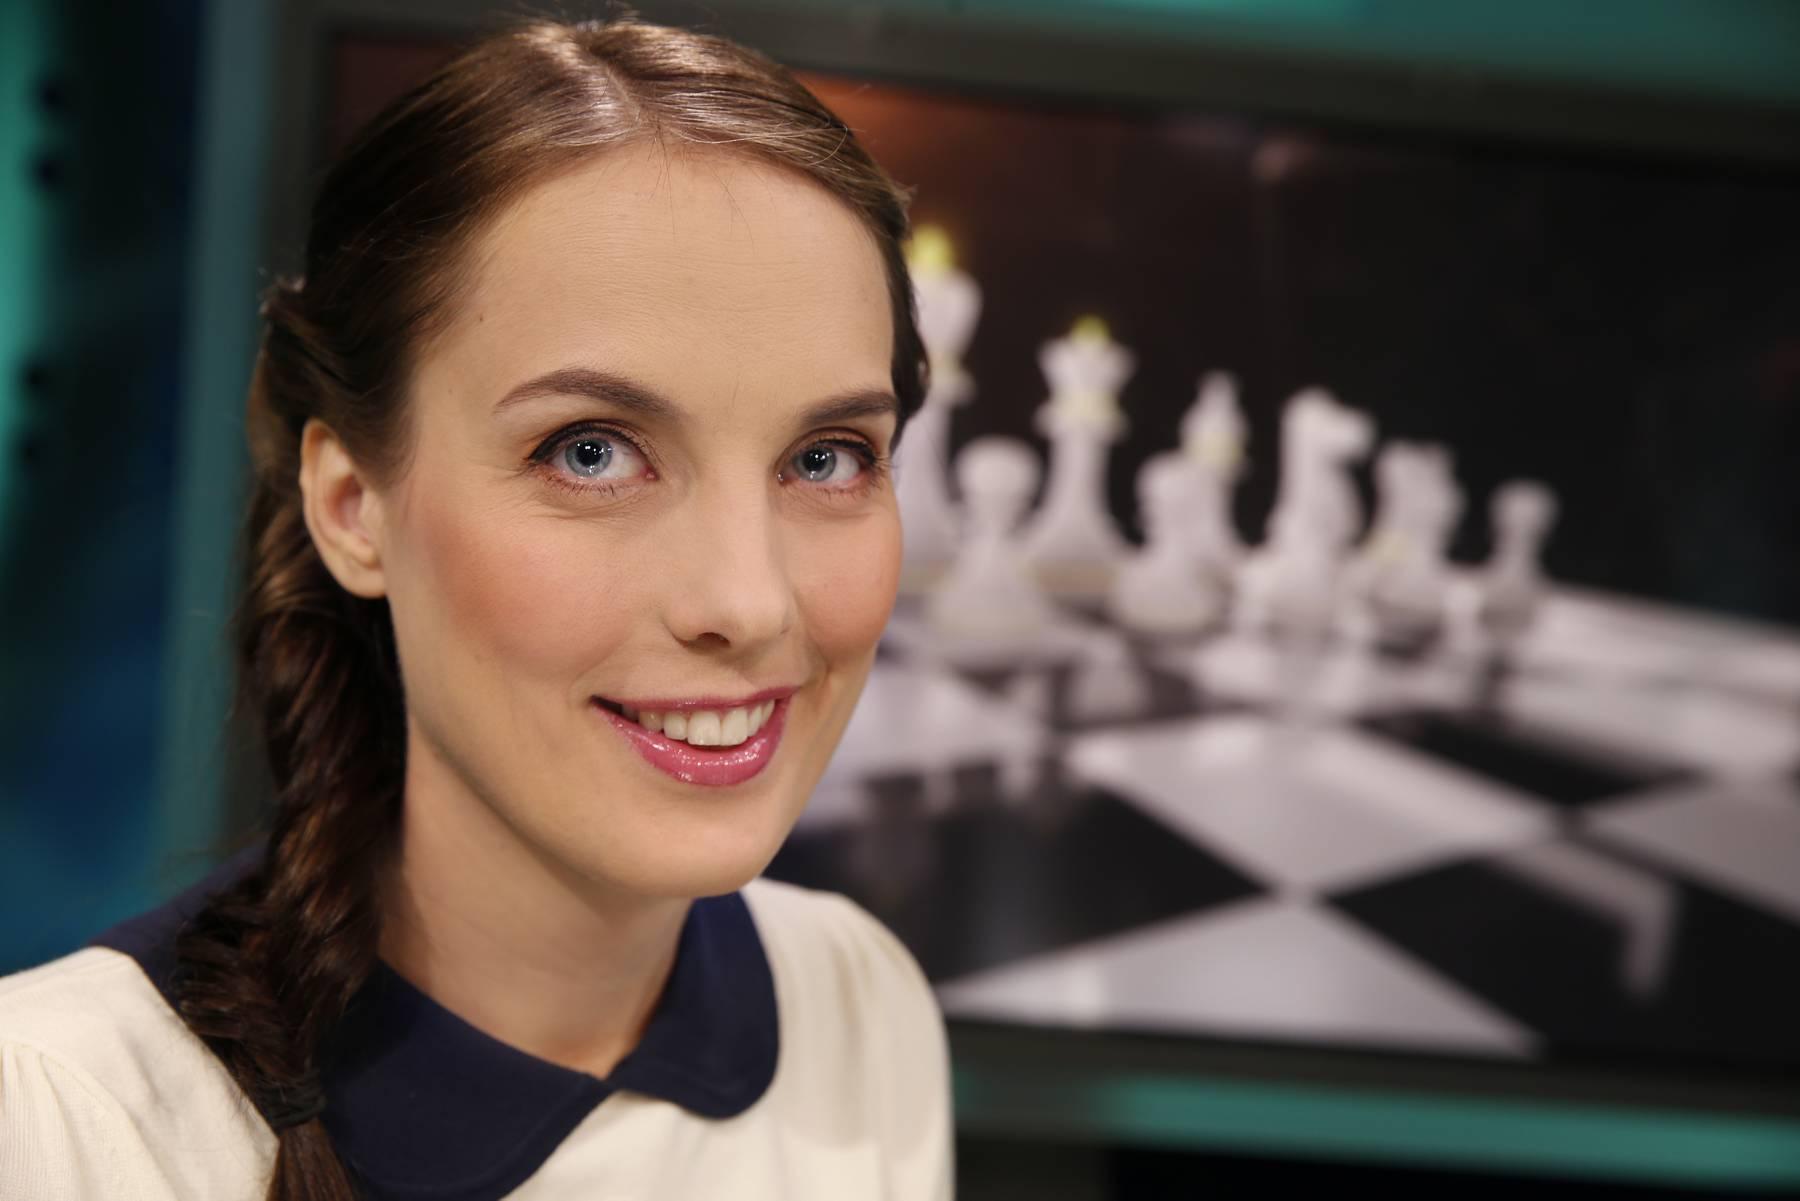 Asker Bridgeklubb Intervju Med Var Sjakk Heidi Nyheter Asker Bk Klubber Nbf Buskerud Kretser Vi Samler Bridgen Til Ett Sted Askerbk Org